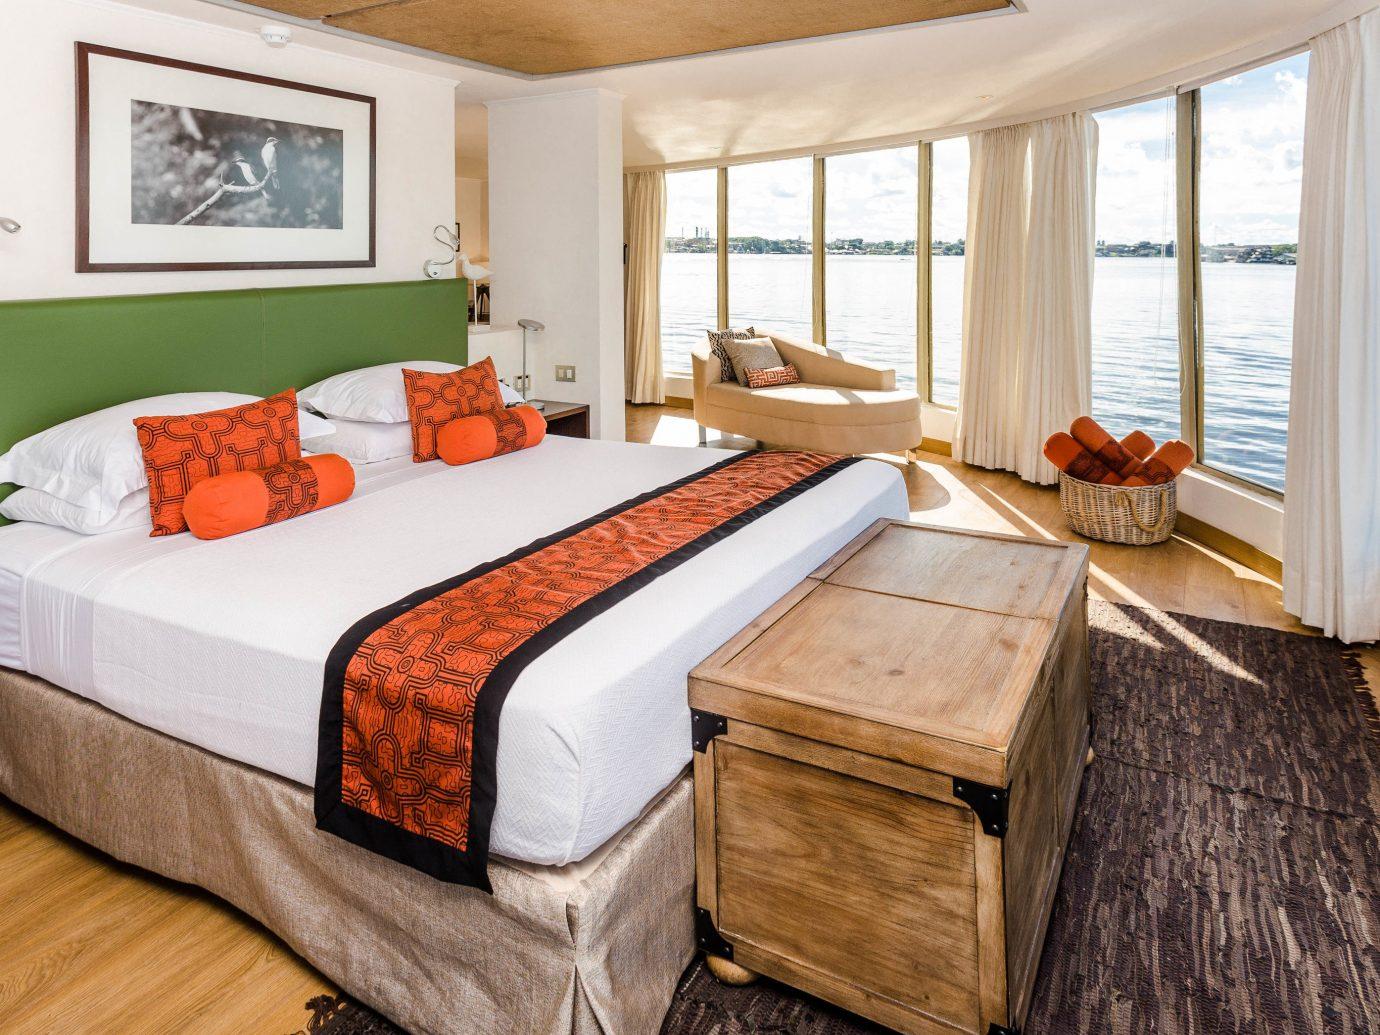 Trip Ideas floor indoor bed room window bed frame Bedroom Suite real estate interior design wood bed sheet flooring furniture